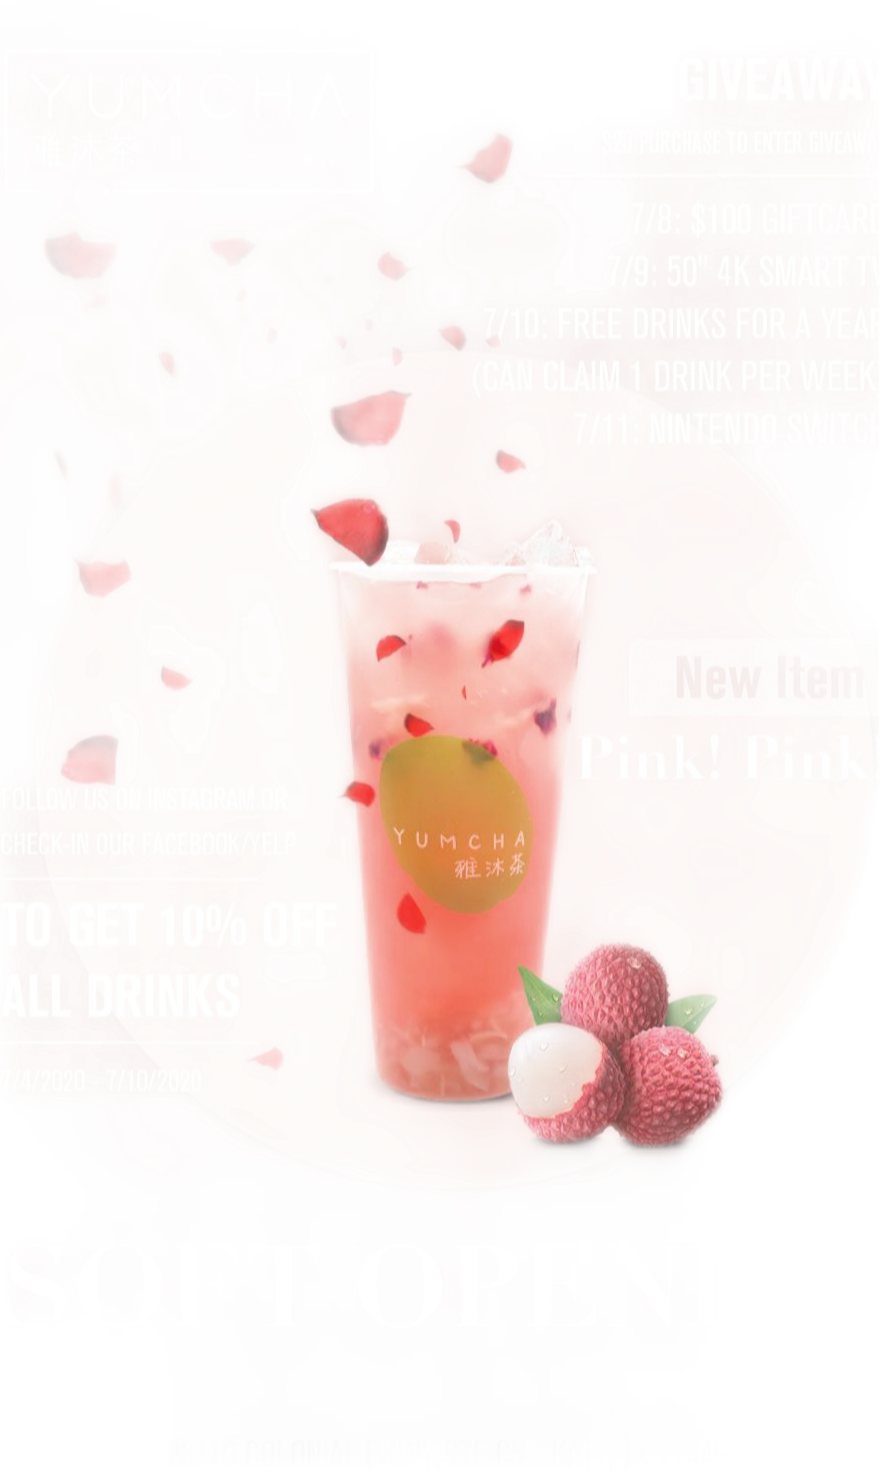 YUMCHA【雅沐茶】Pink! Pink! 霸气玫瑰荔枝茶